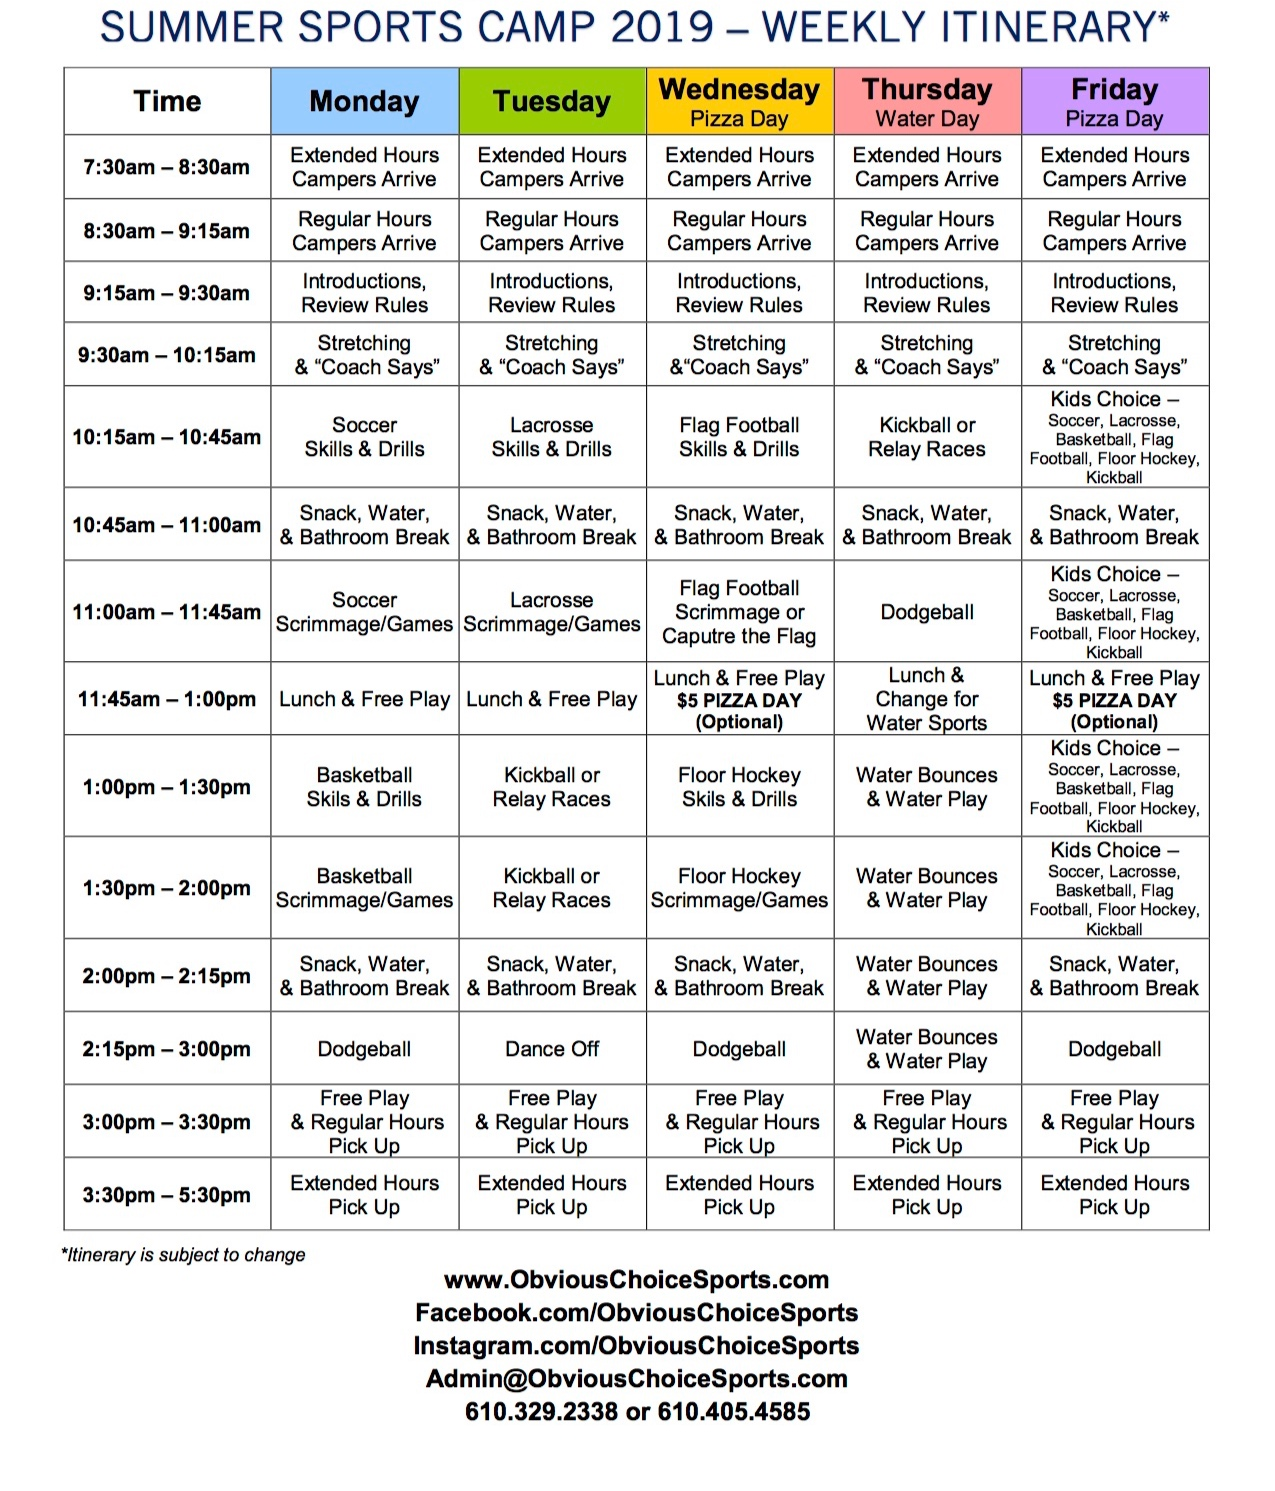 Sports+Camp+-+Website+Itinerary+-+2019.jpg